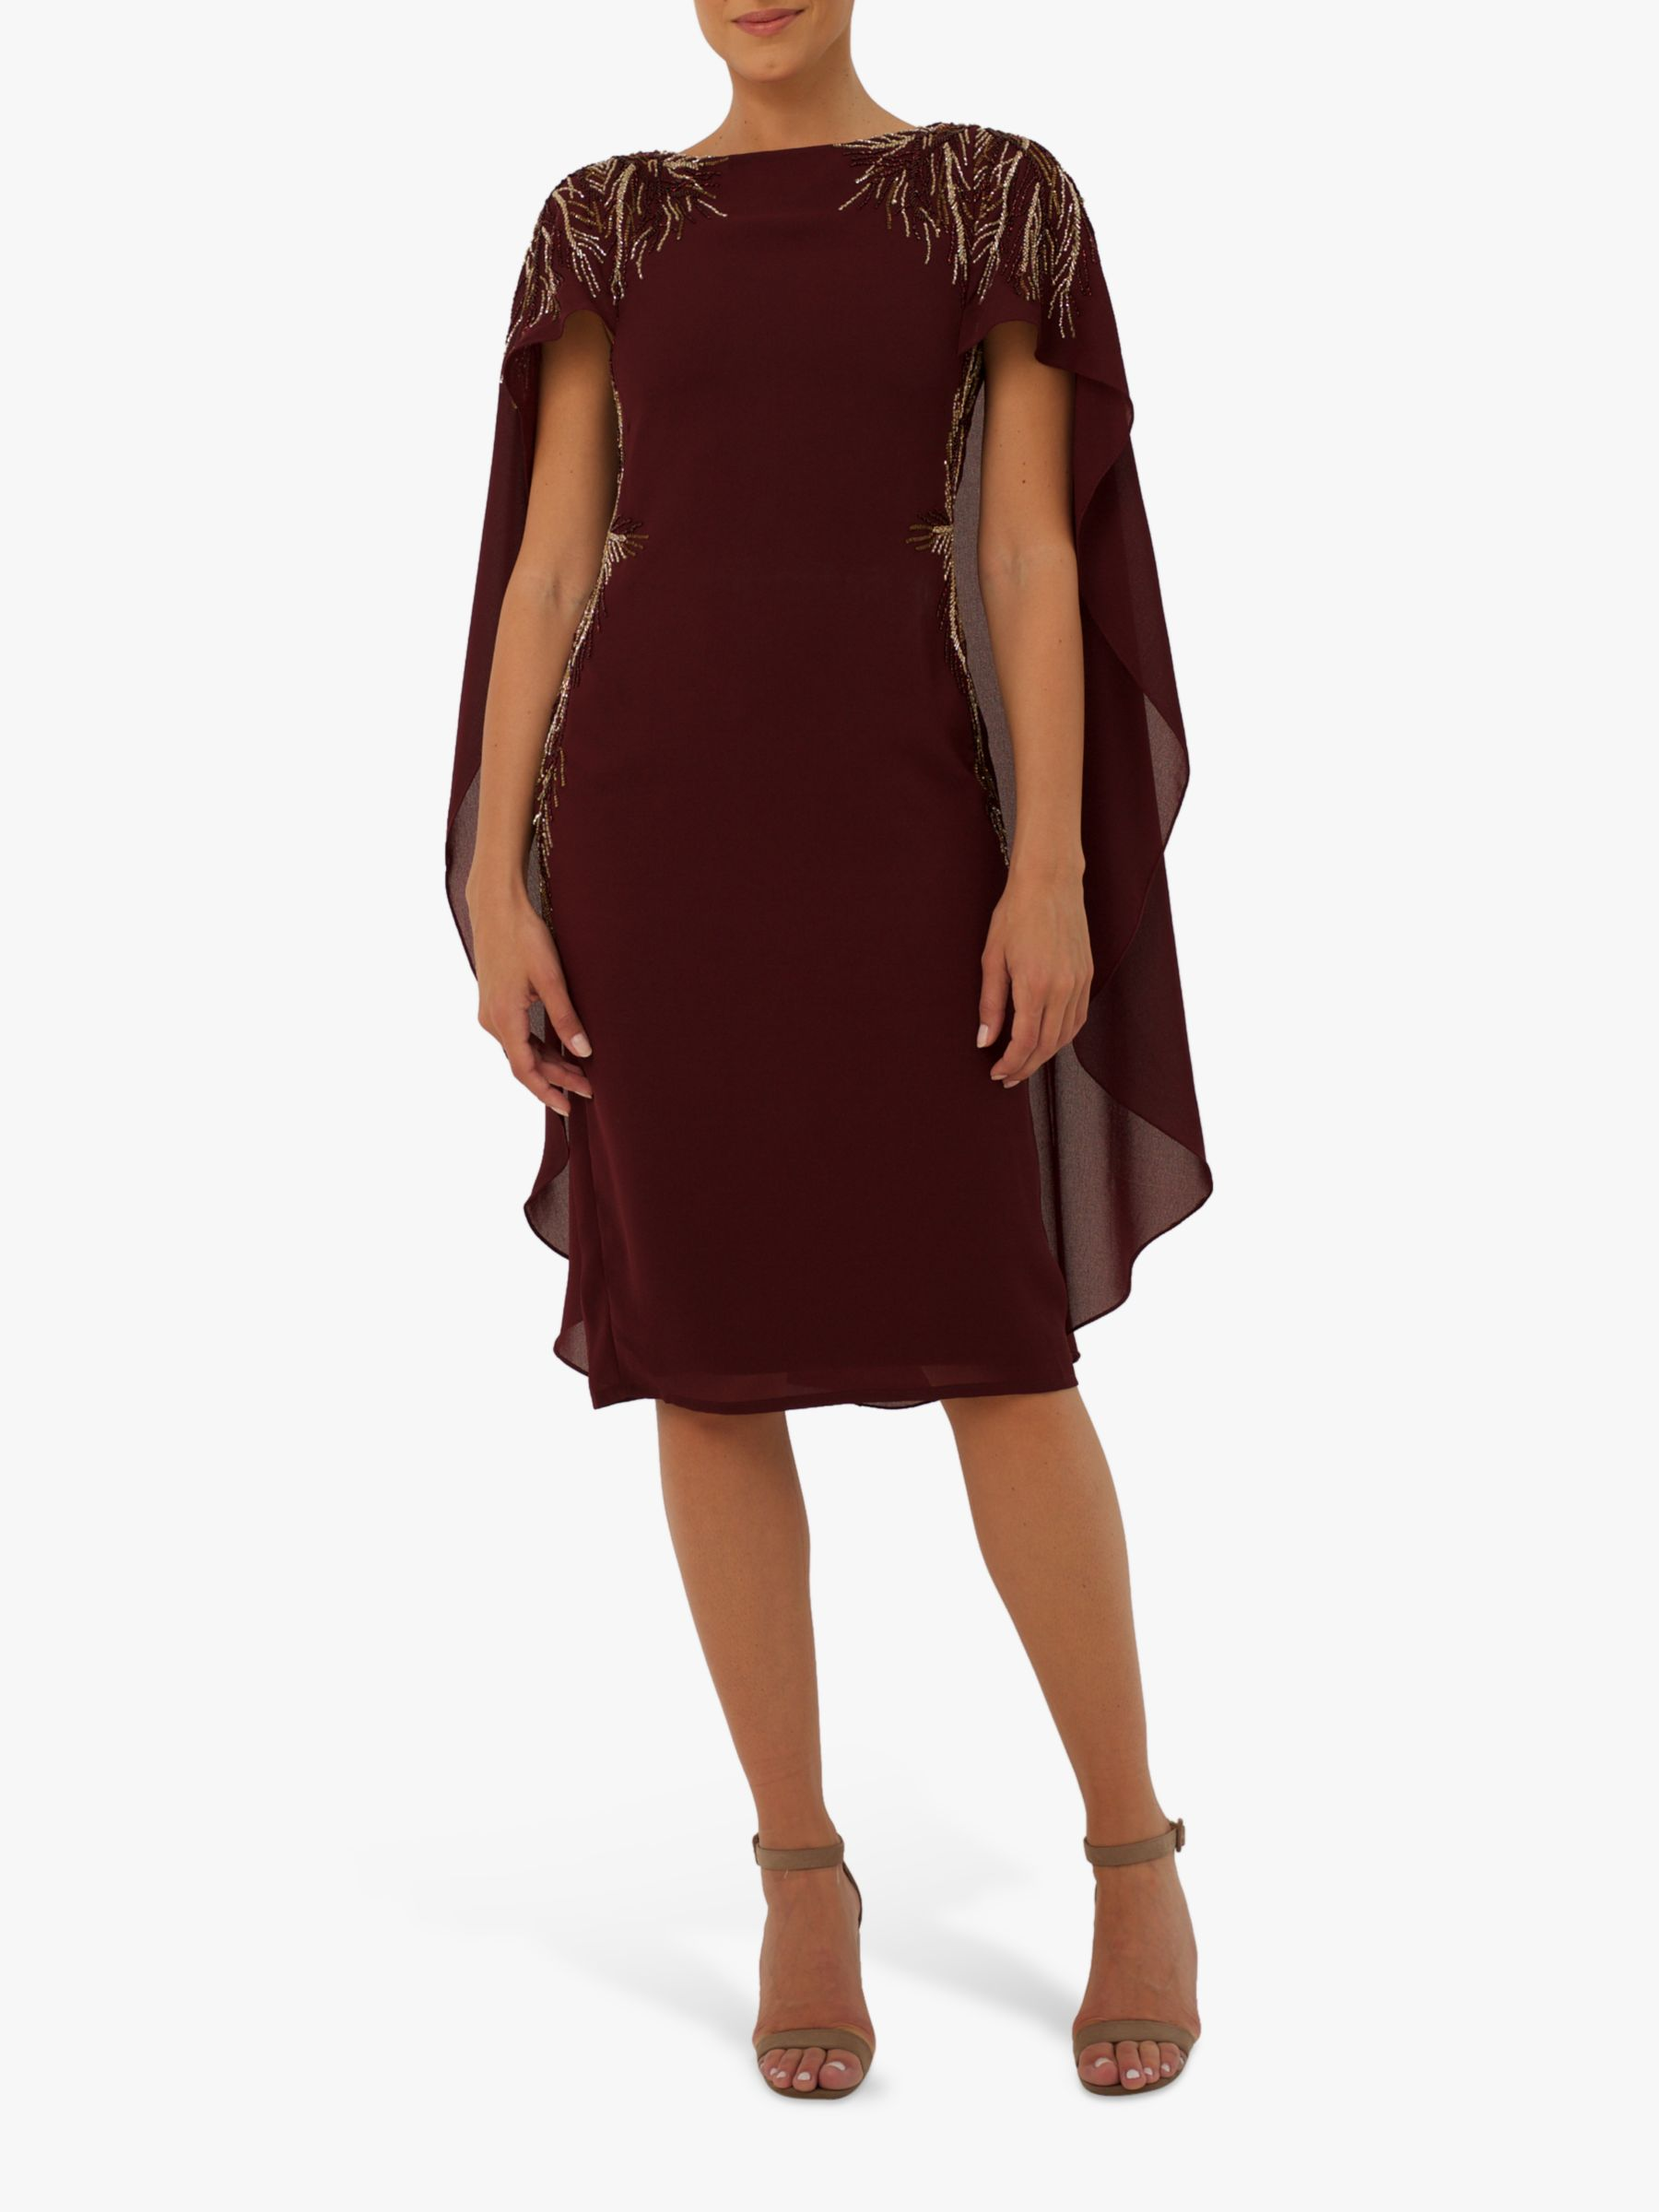 RAISHMA Raishma Eva Sequin Detail Cape Dress